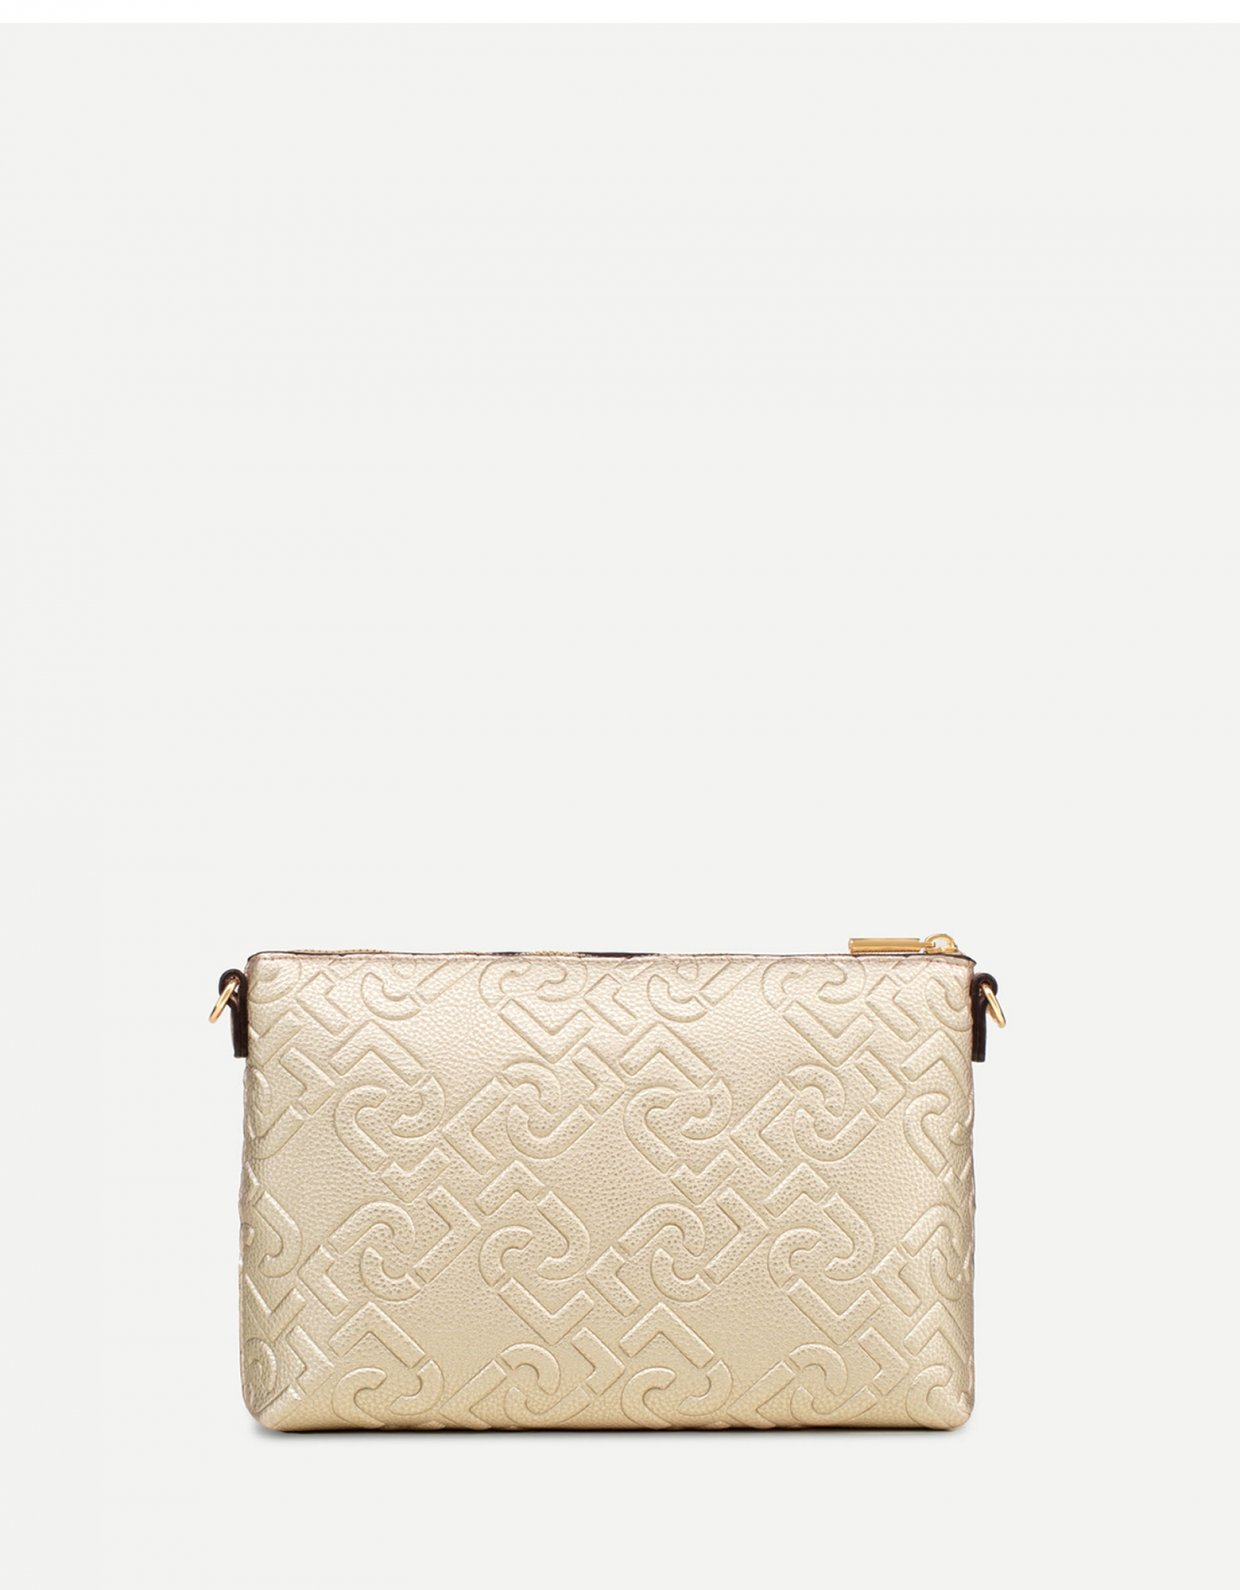 Liu Jo Set of bags with logo light gold